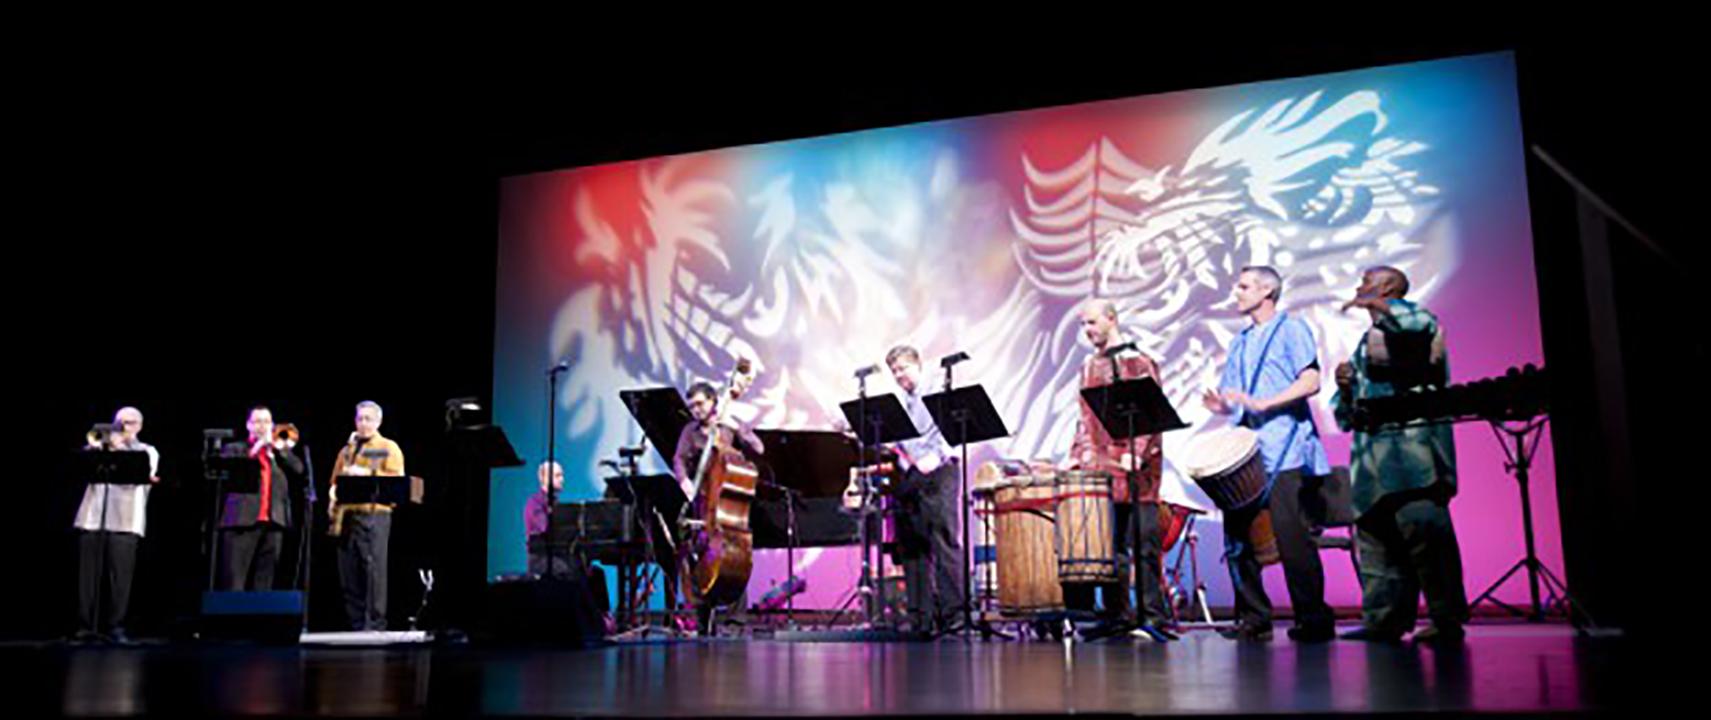 16th Annual Peace Concert